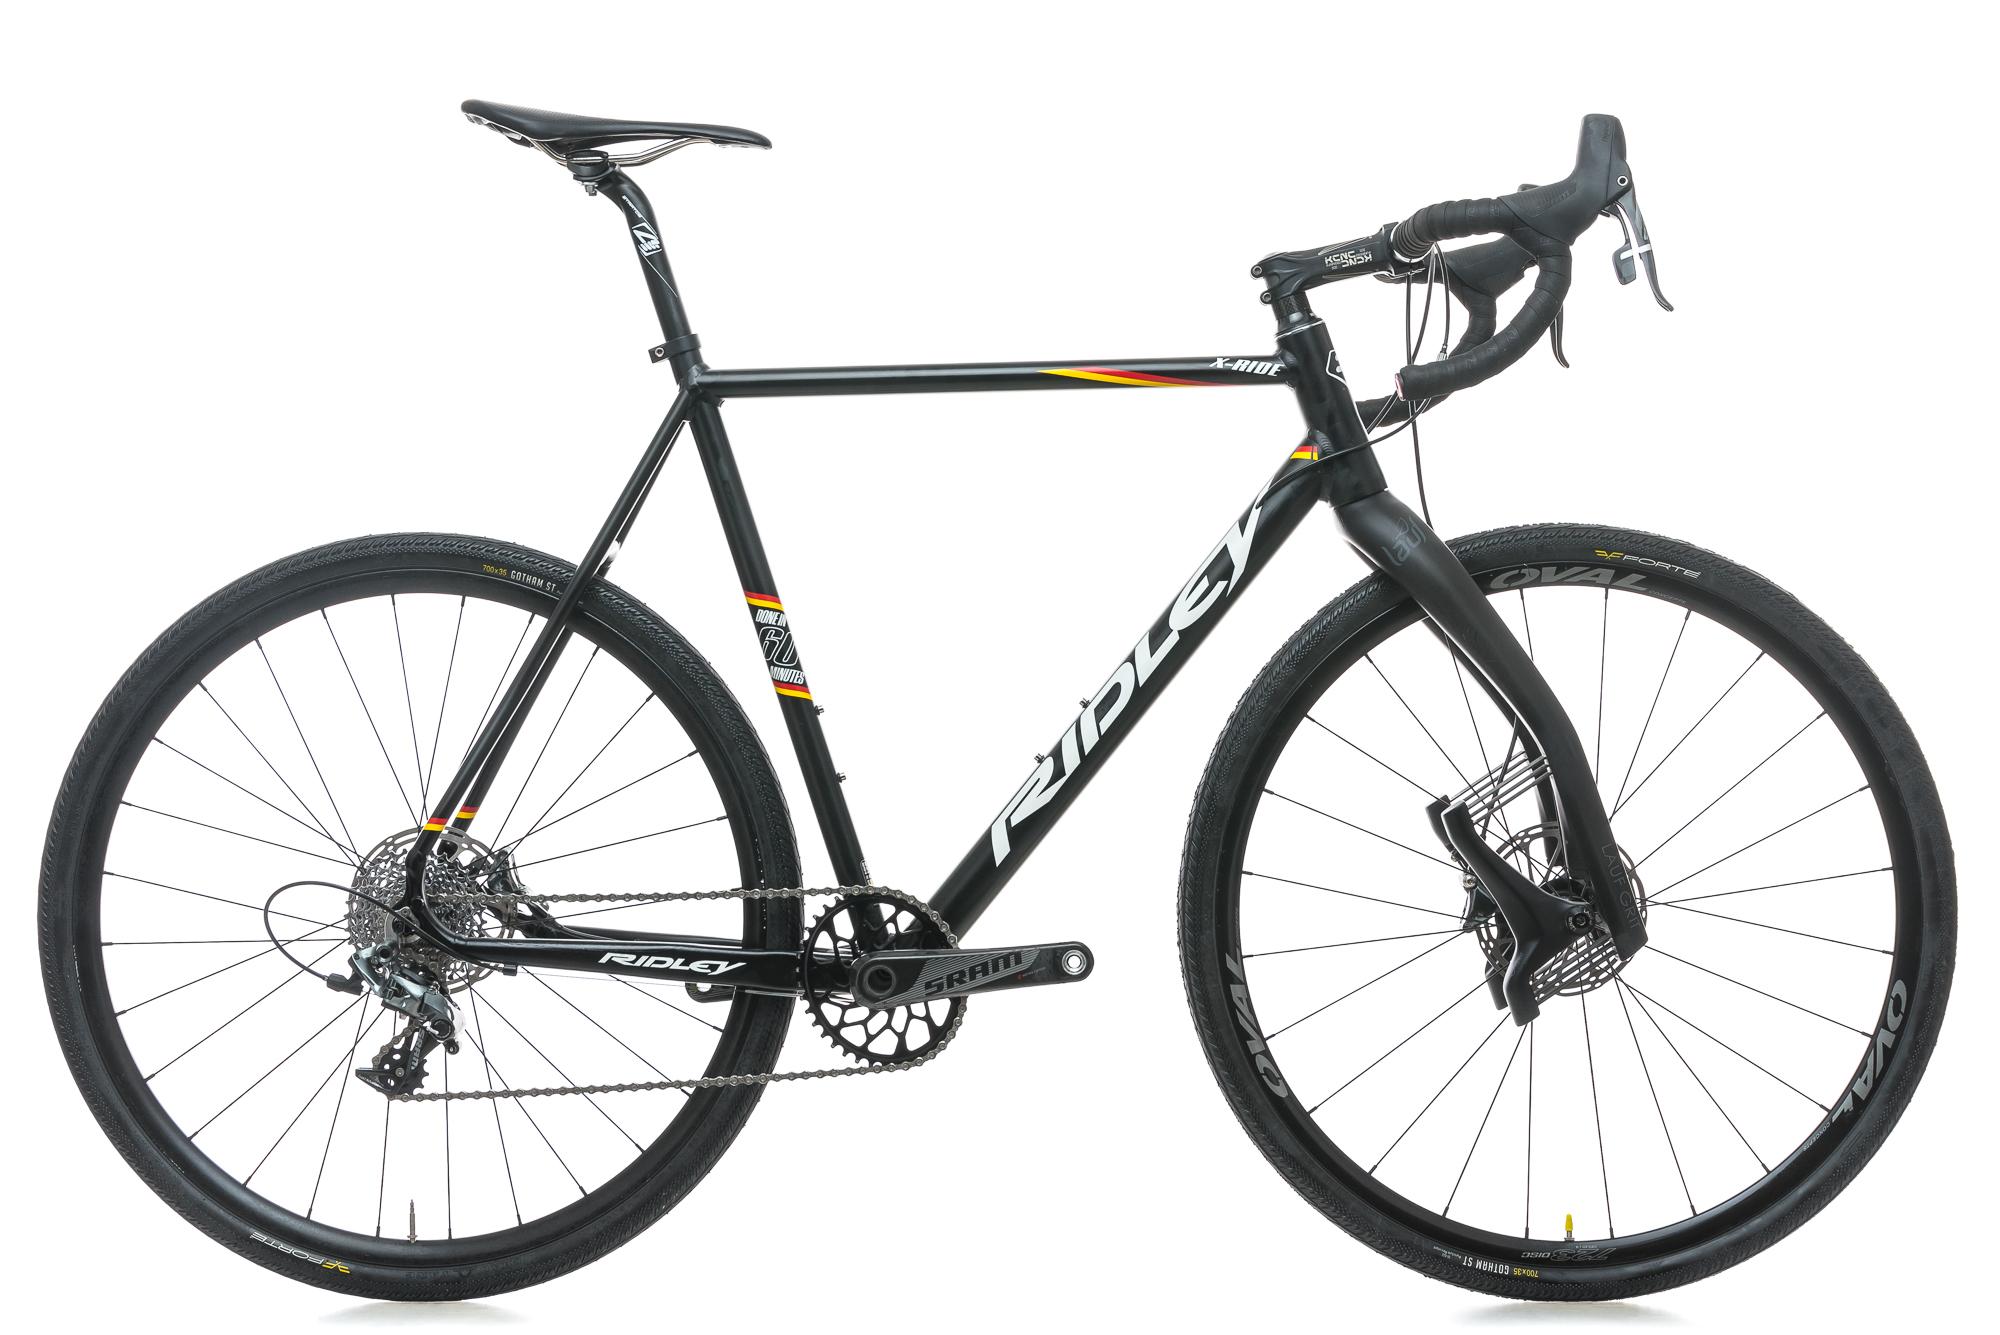 2017 Ridley X-Ride Cyclocross Bike 56cm Large Aluminum